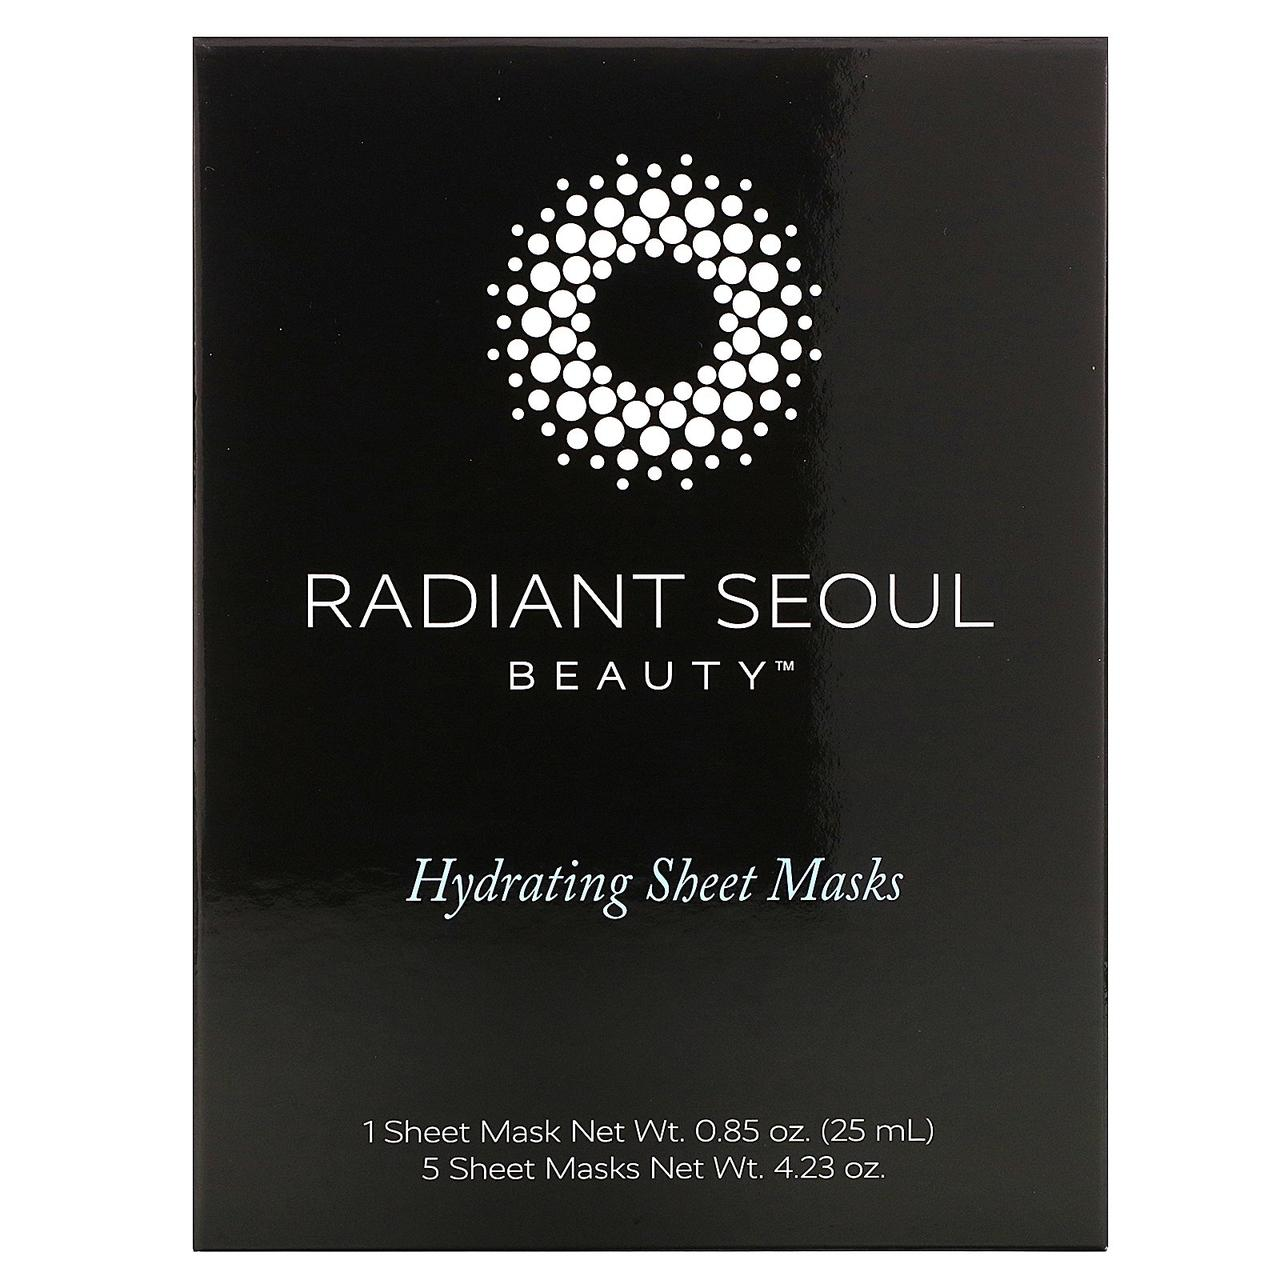 Увлажняющая тканевая маска, 5 шт. по 25 мл, Radiant Seoul